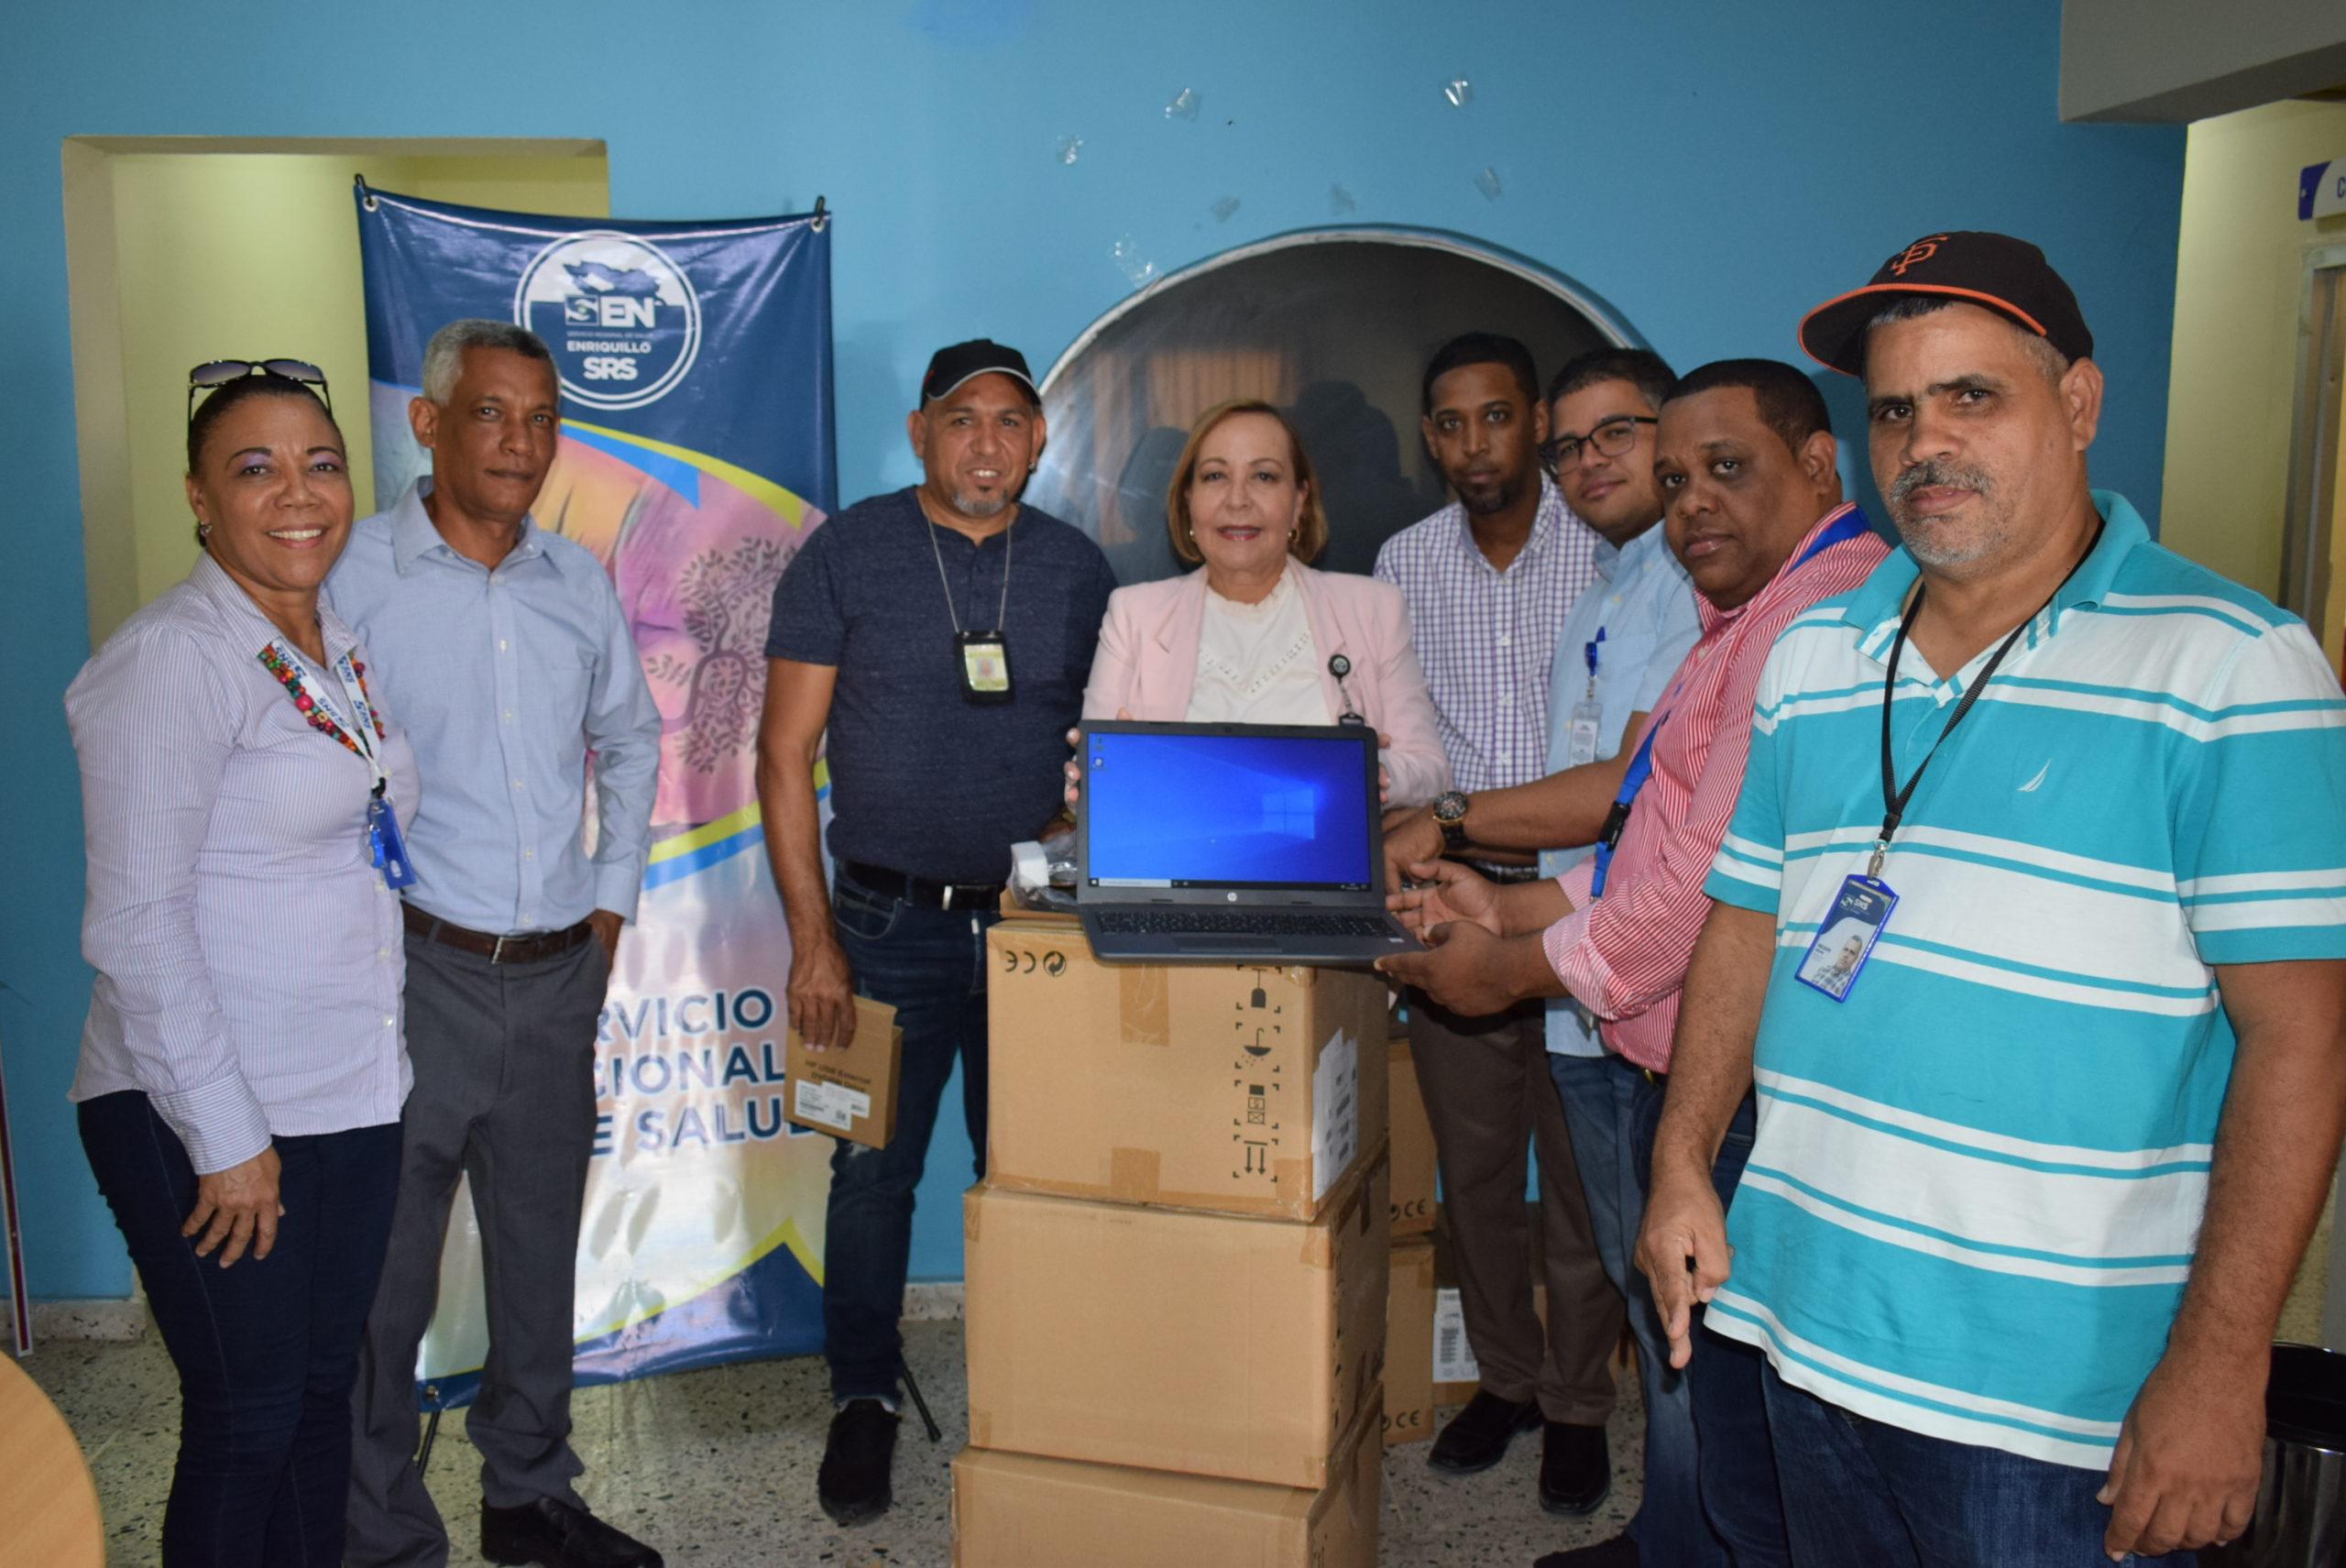 Laptop, SNS  dotó de 30 Laptop a la región de salud Enriquillo